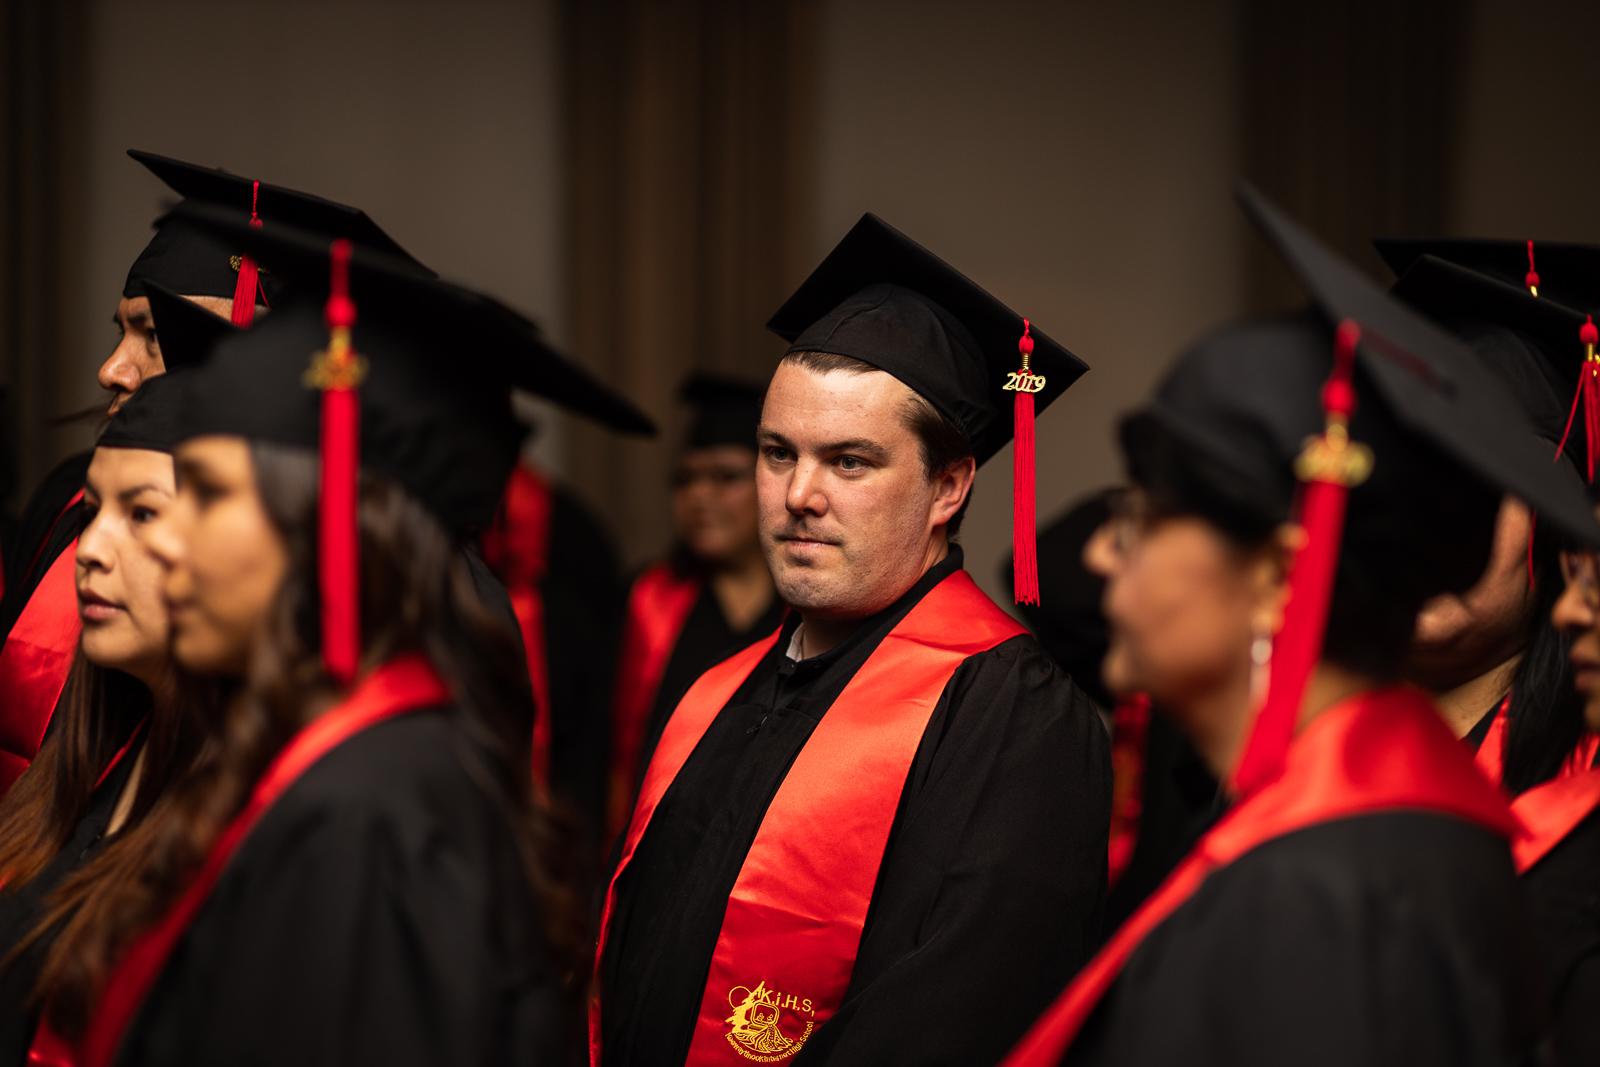 kihs-graduation-2019-fb-12.jpg